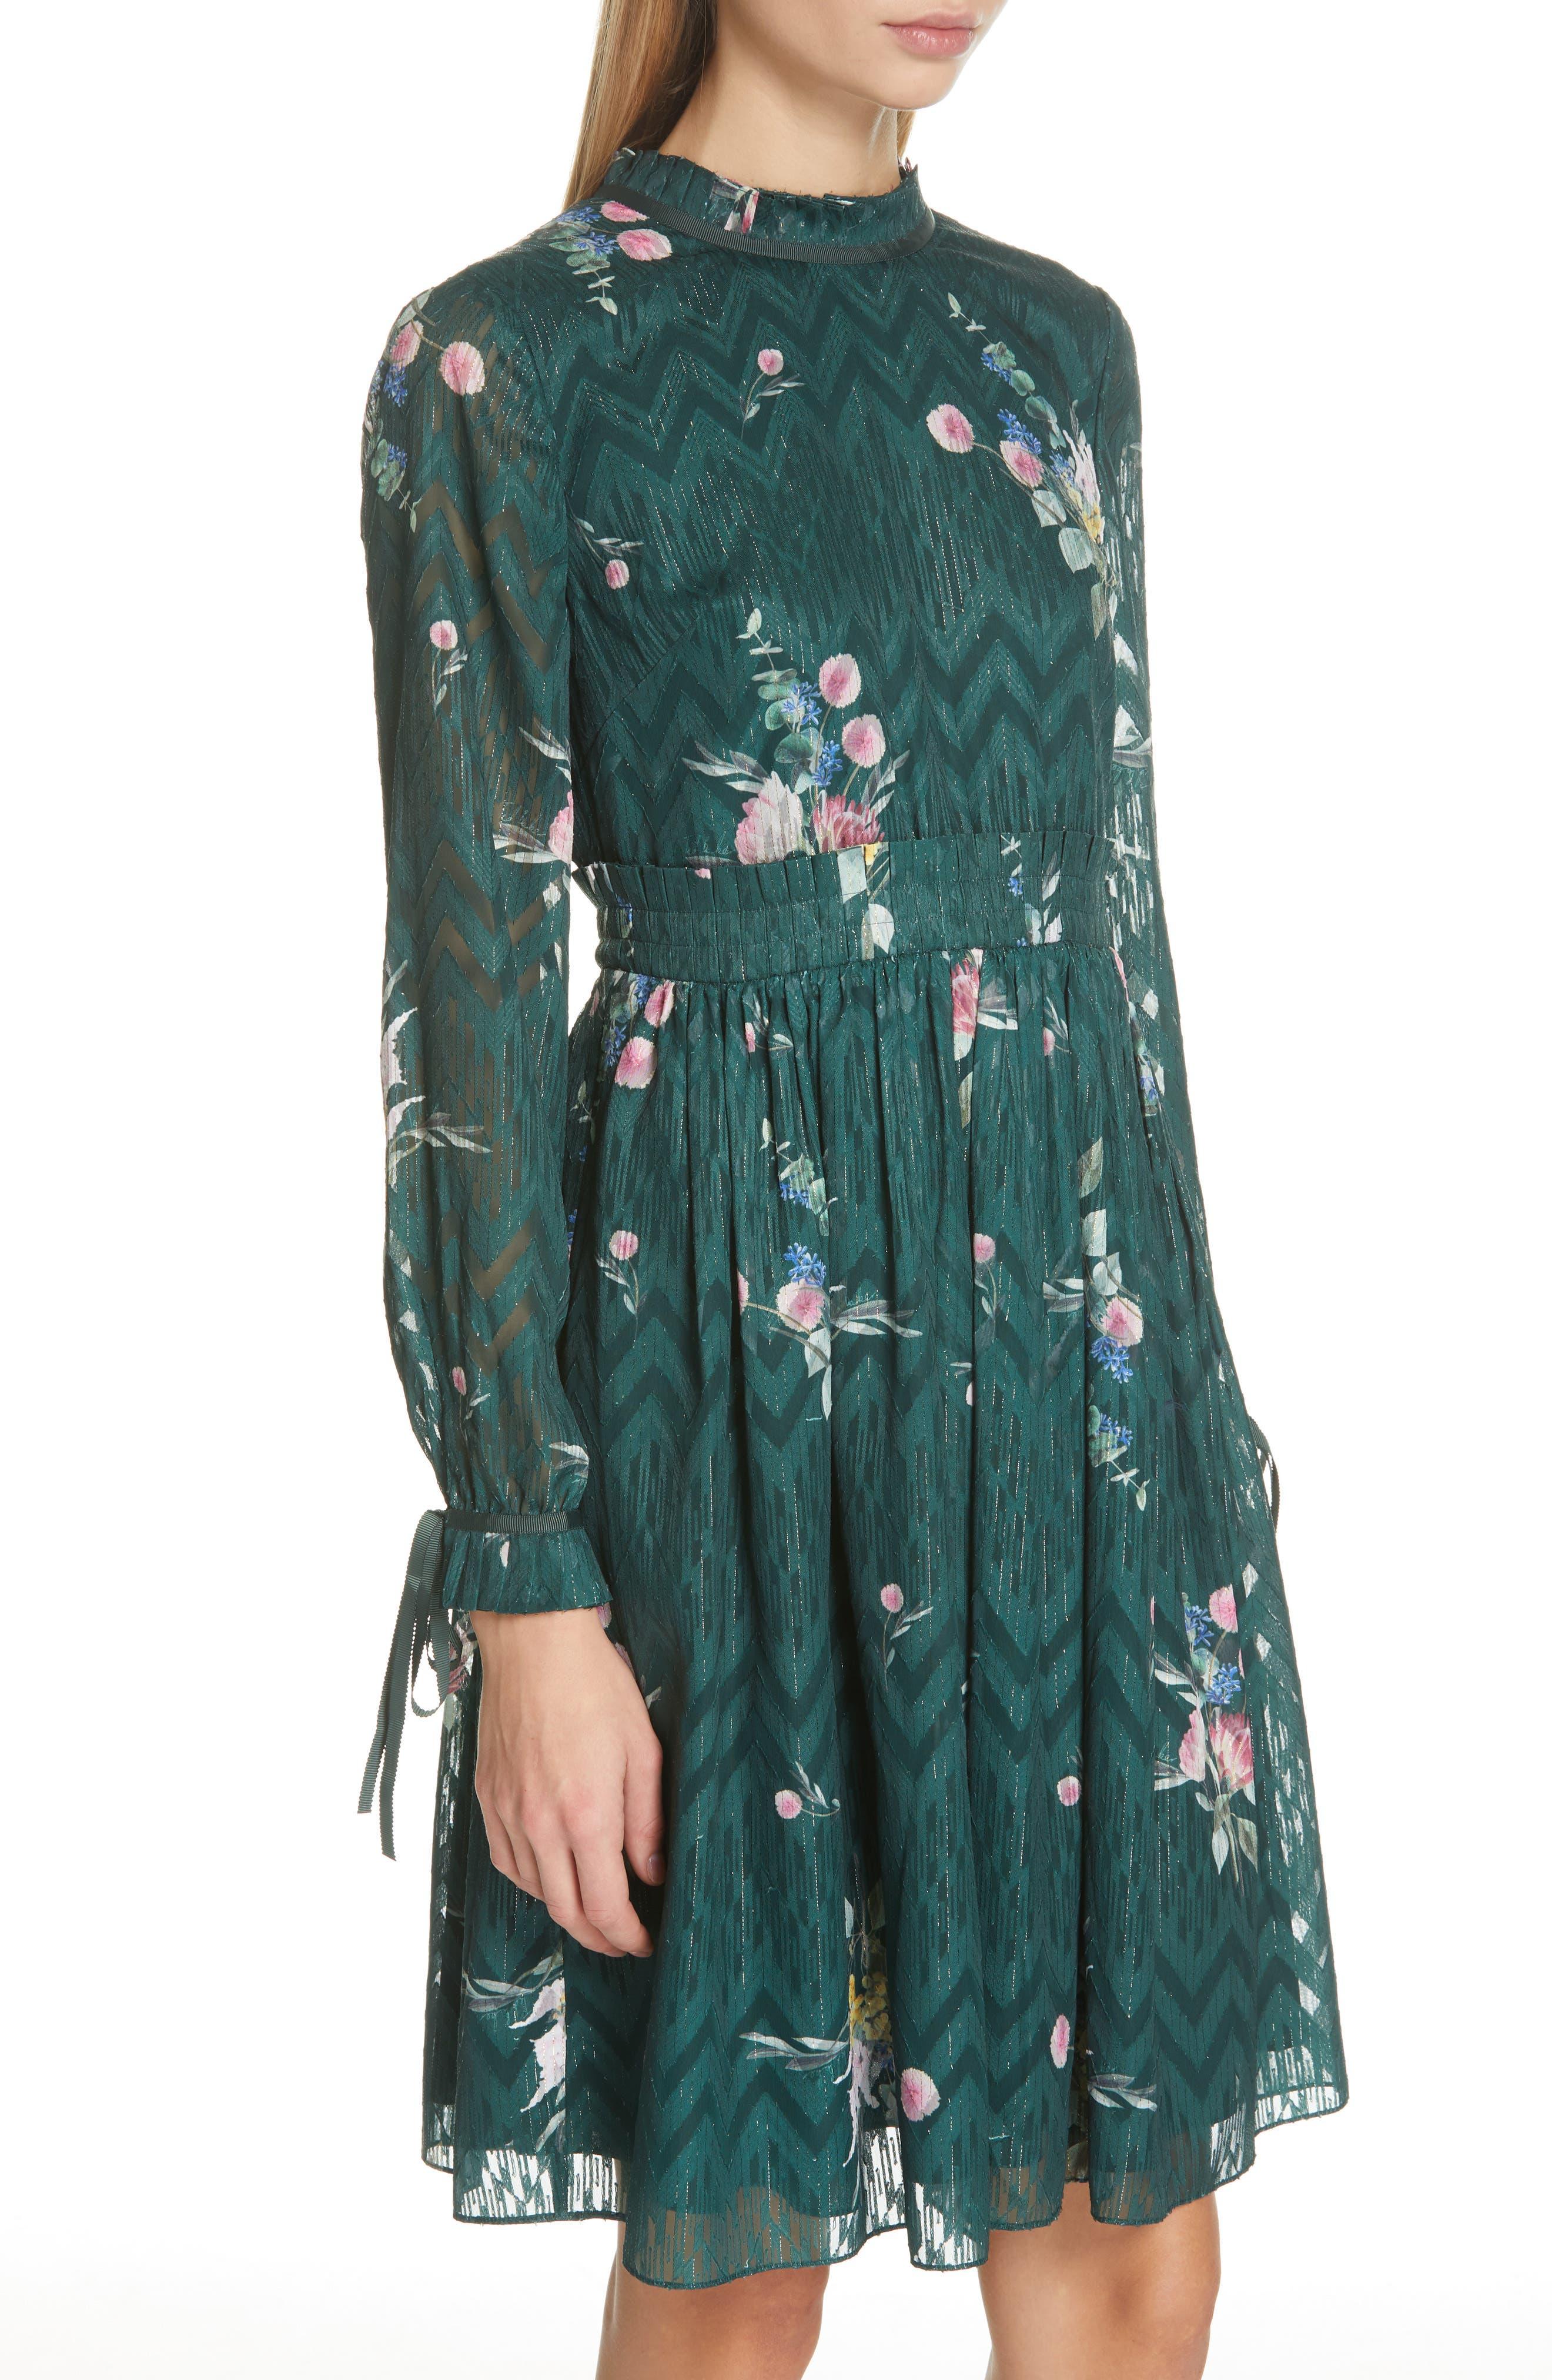 TED BAKER LONDON, Sofiya Floral Ribbon Tie Dress, Alternate thumbnail 5, color, DARK GREEN